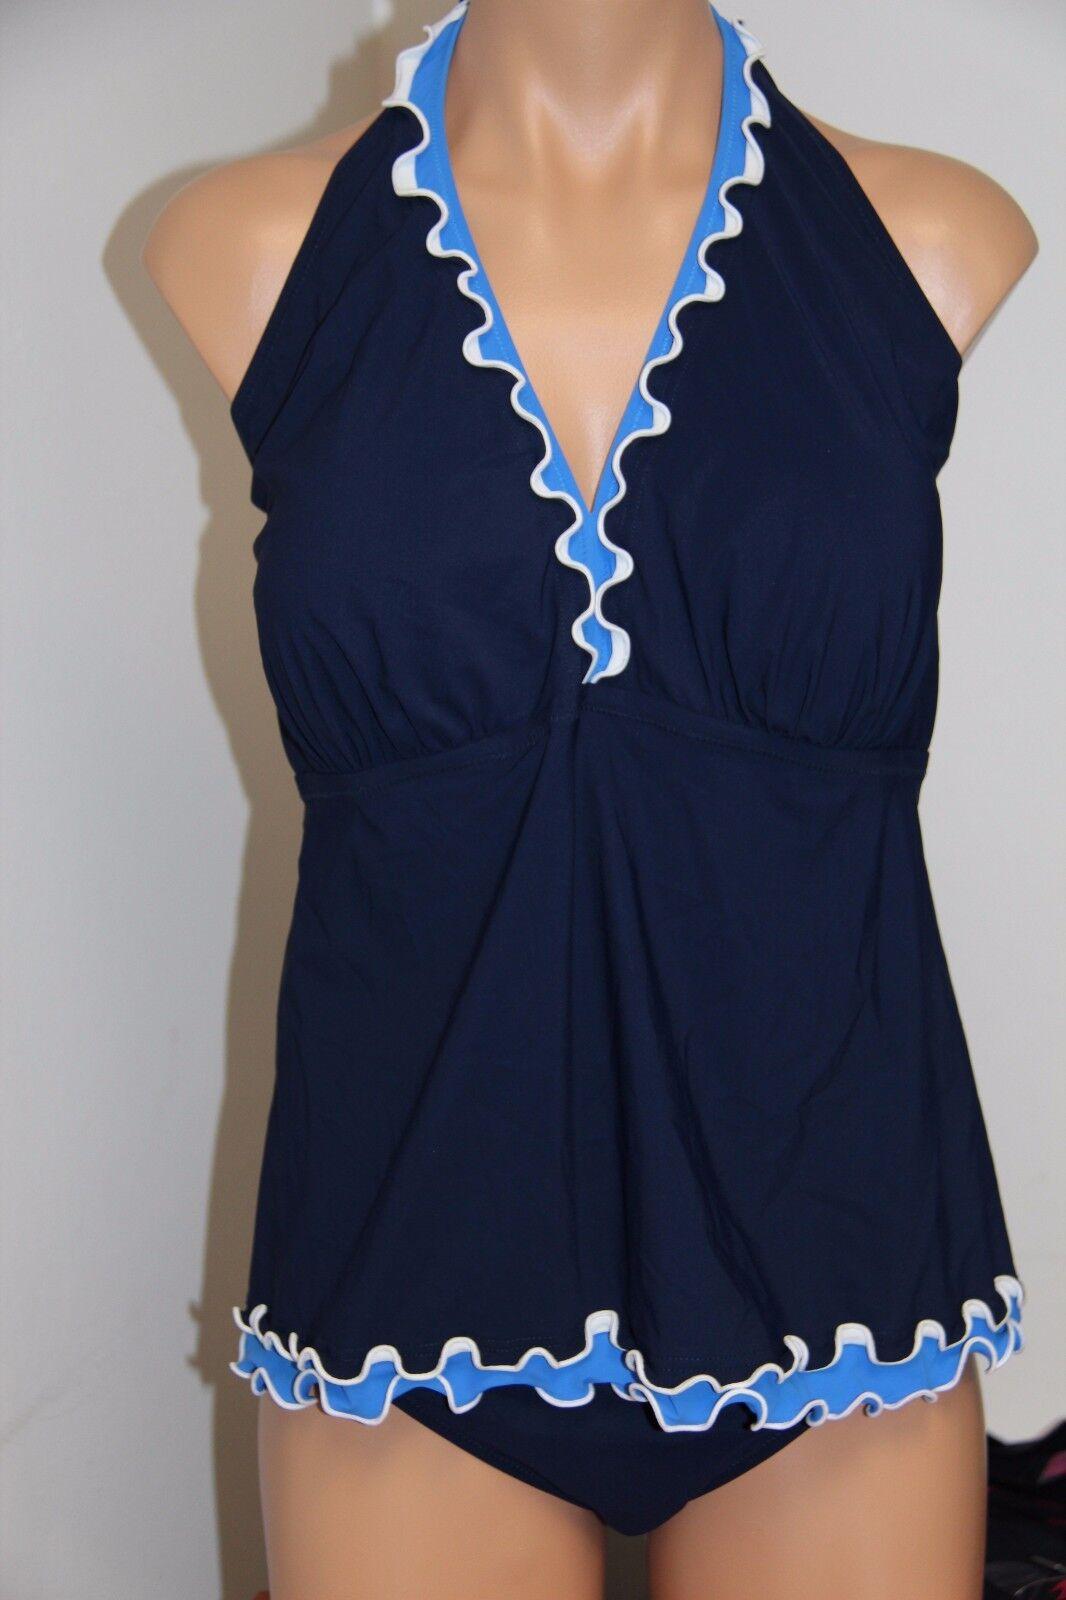 NWT Profile Swimsuit Tankini Bikini Bikini Bikini 2pc set Plus Sz 20W Halter High Waist Navy f767de